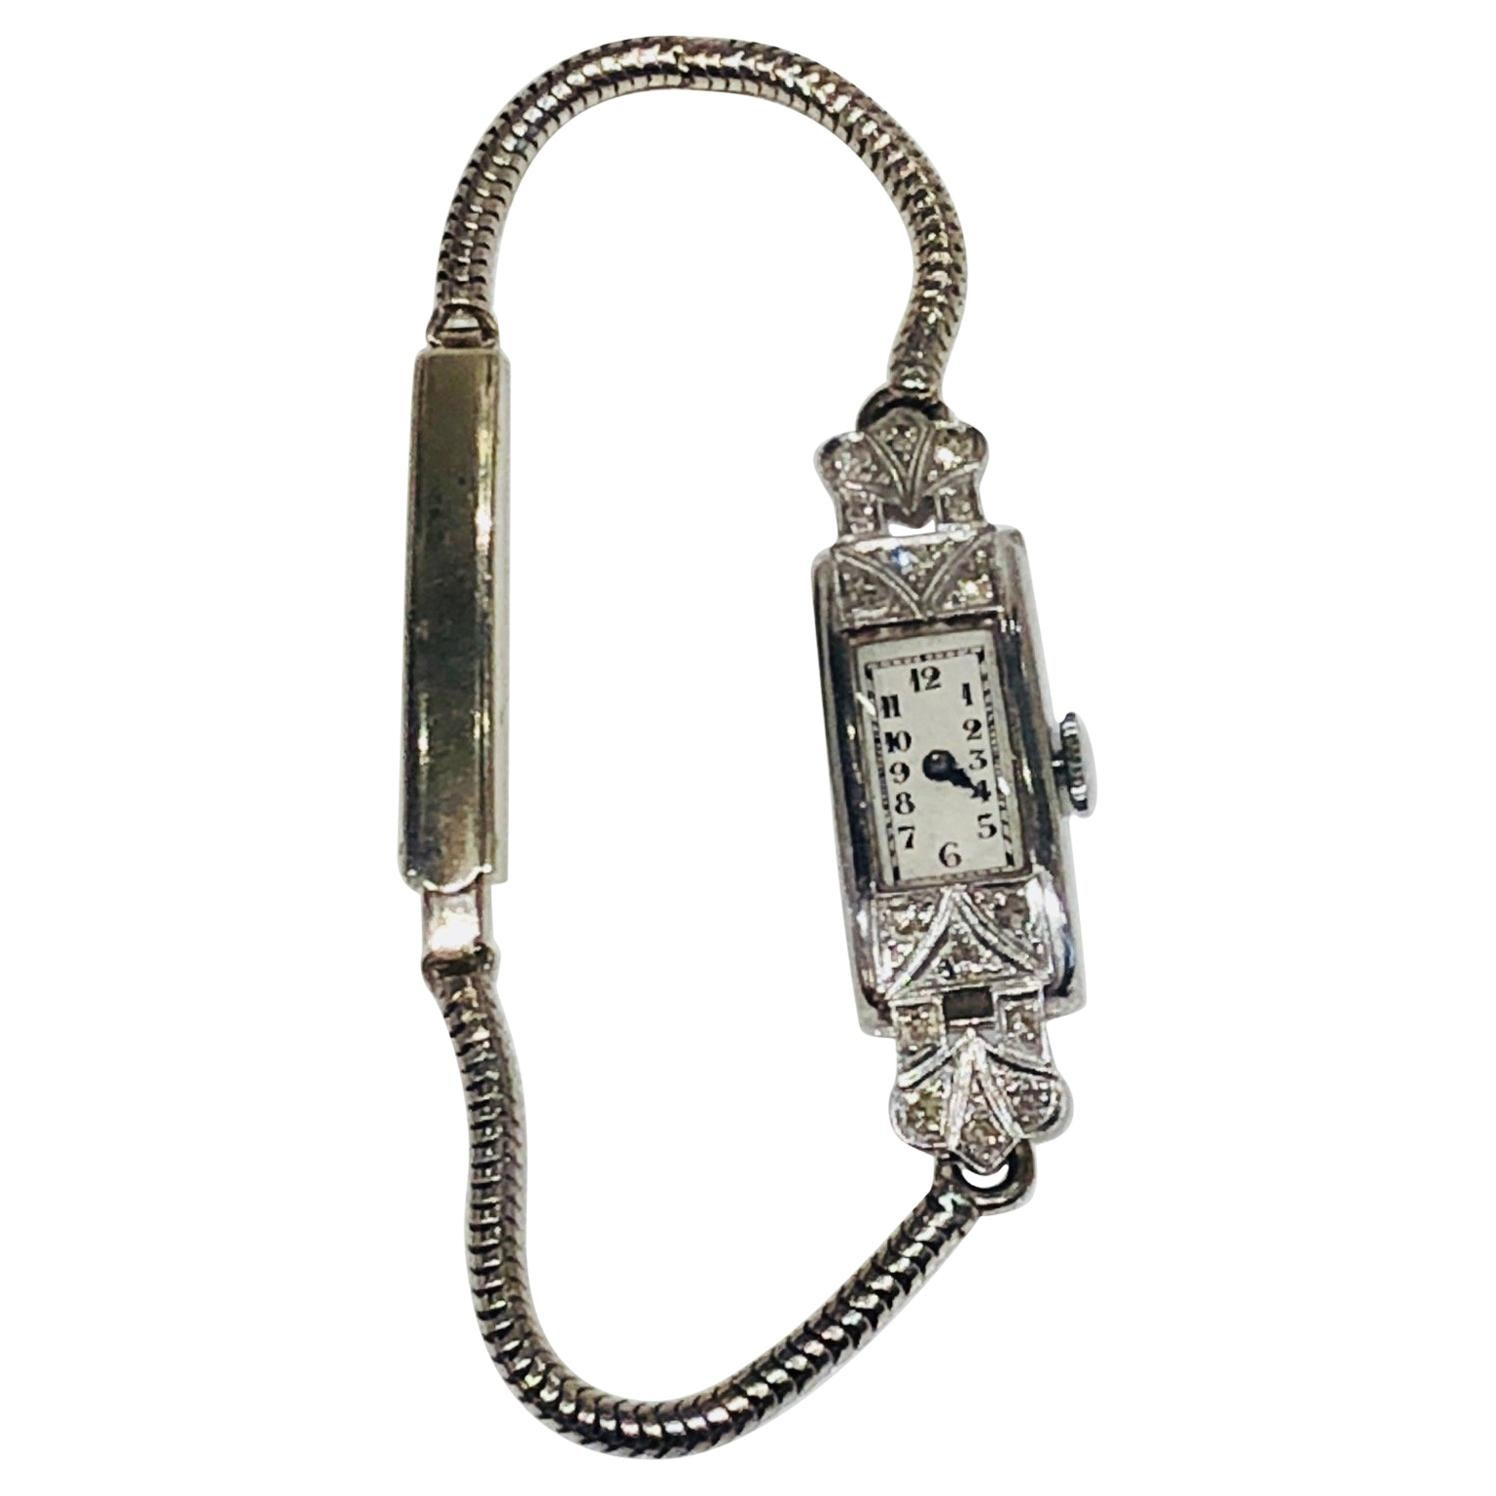 Art Deco Diamond Encrusted Cocktail Wrist Watch, Platinum